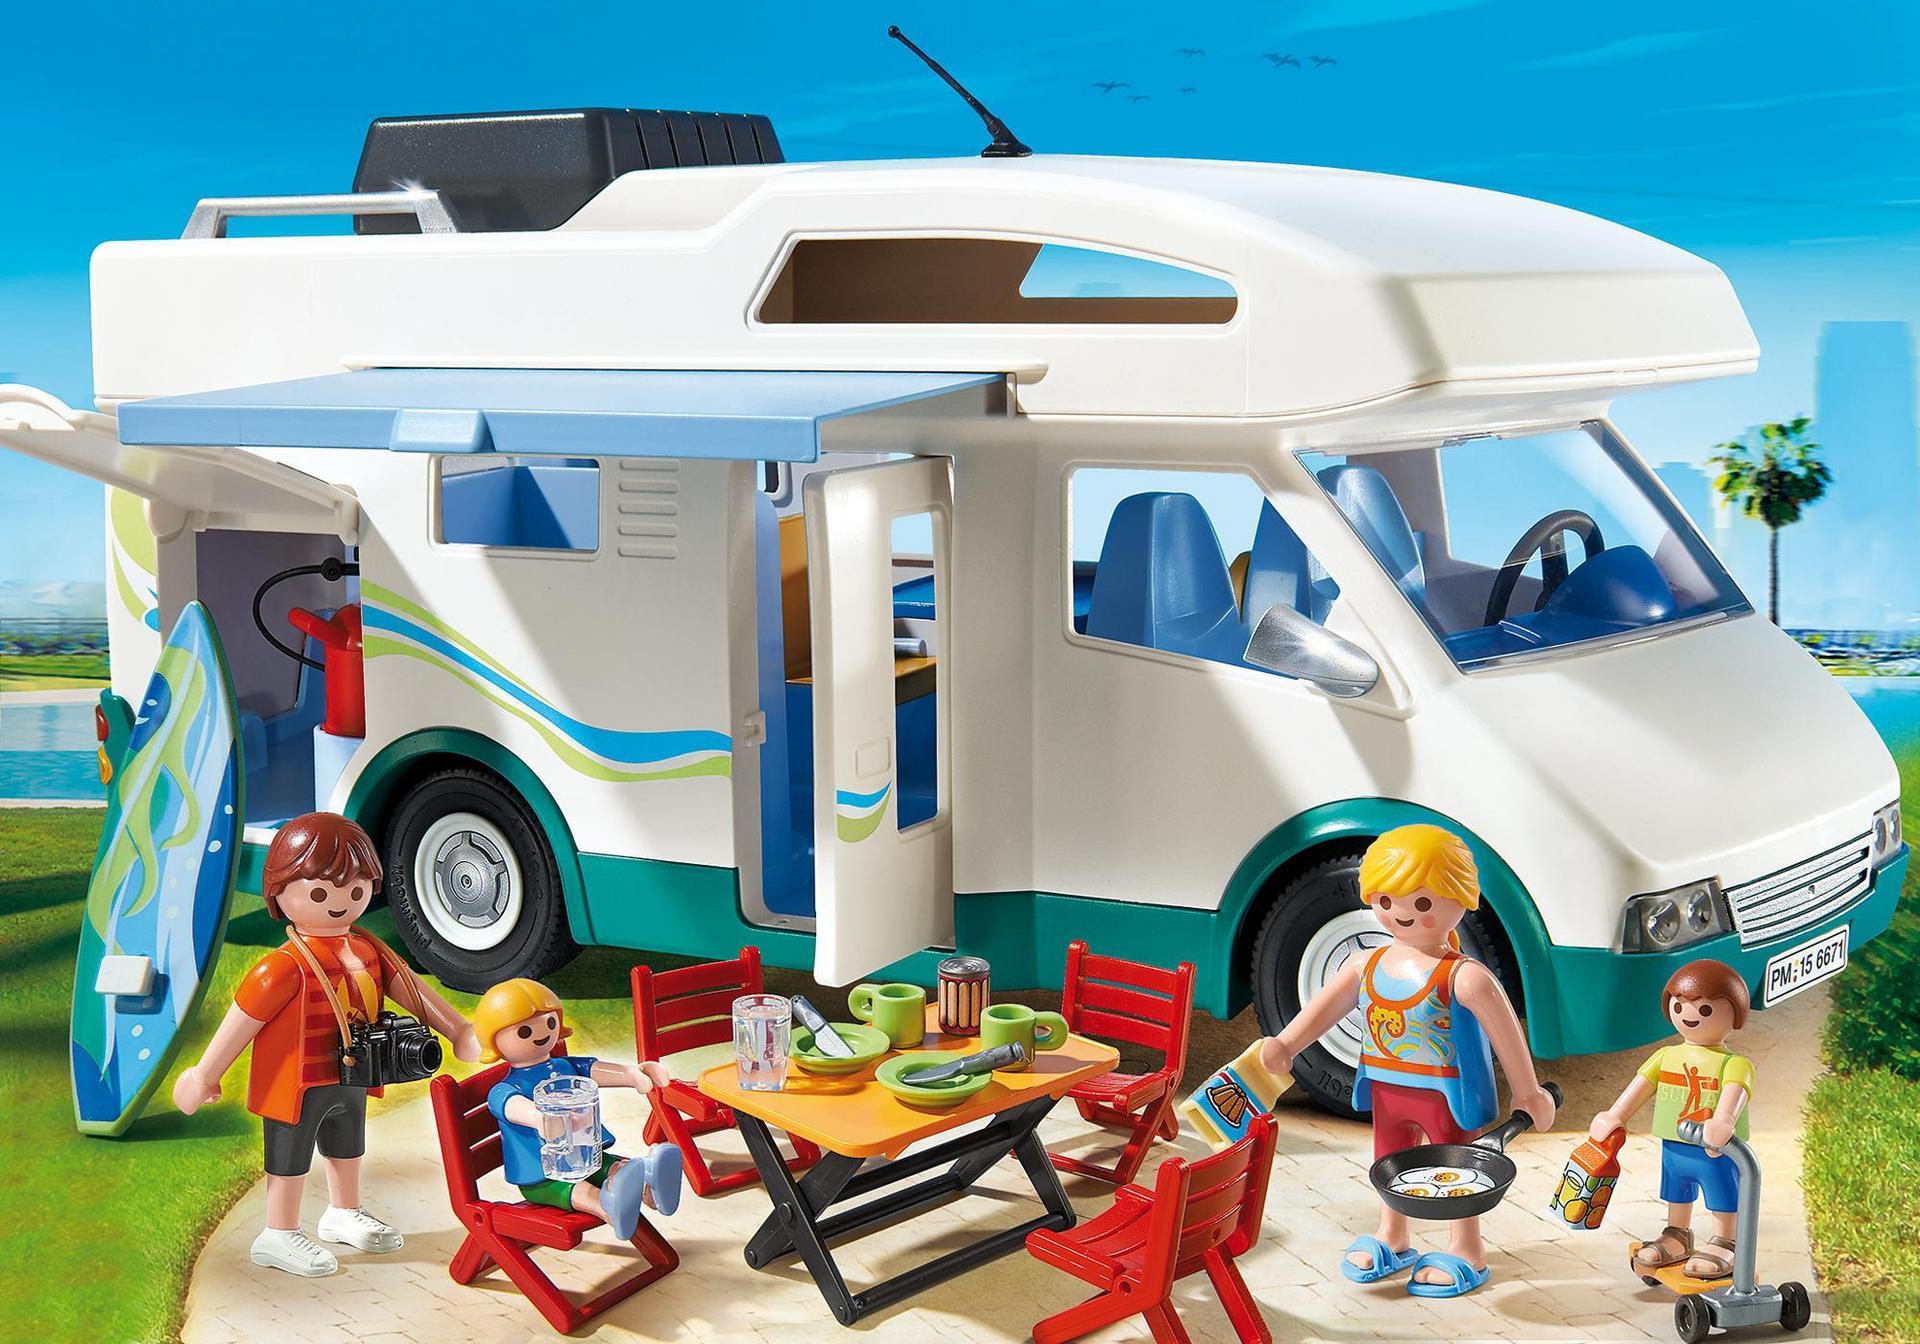 Playmobil Campingplatz Ausmalbilder : Familien Wohnmobil 6671 Playmobil Schweiz